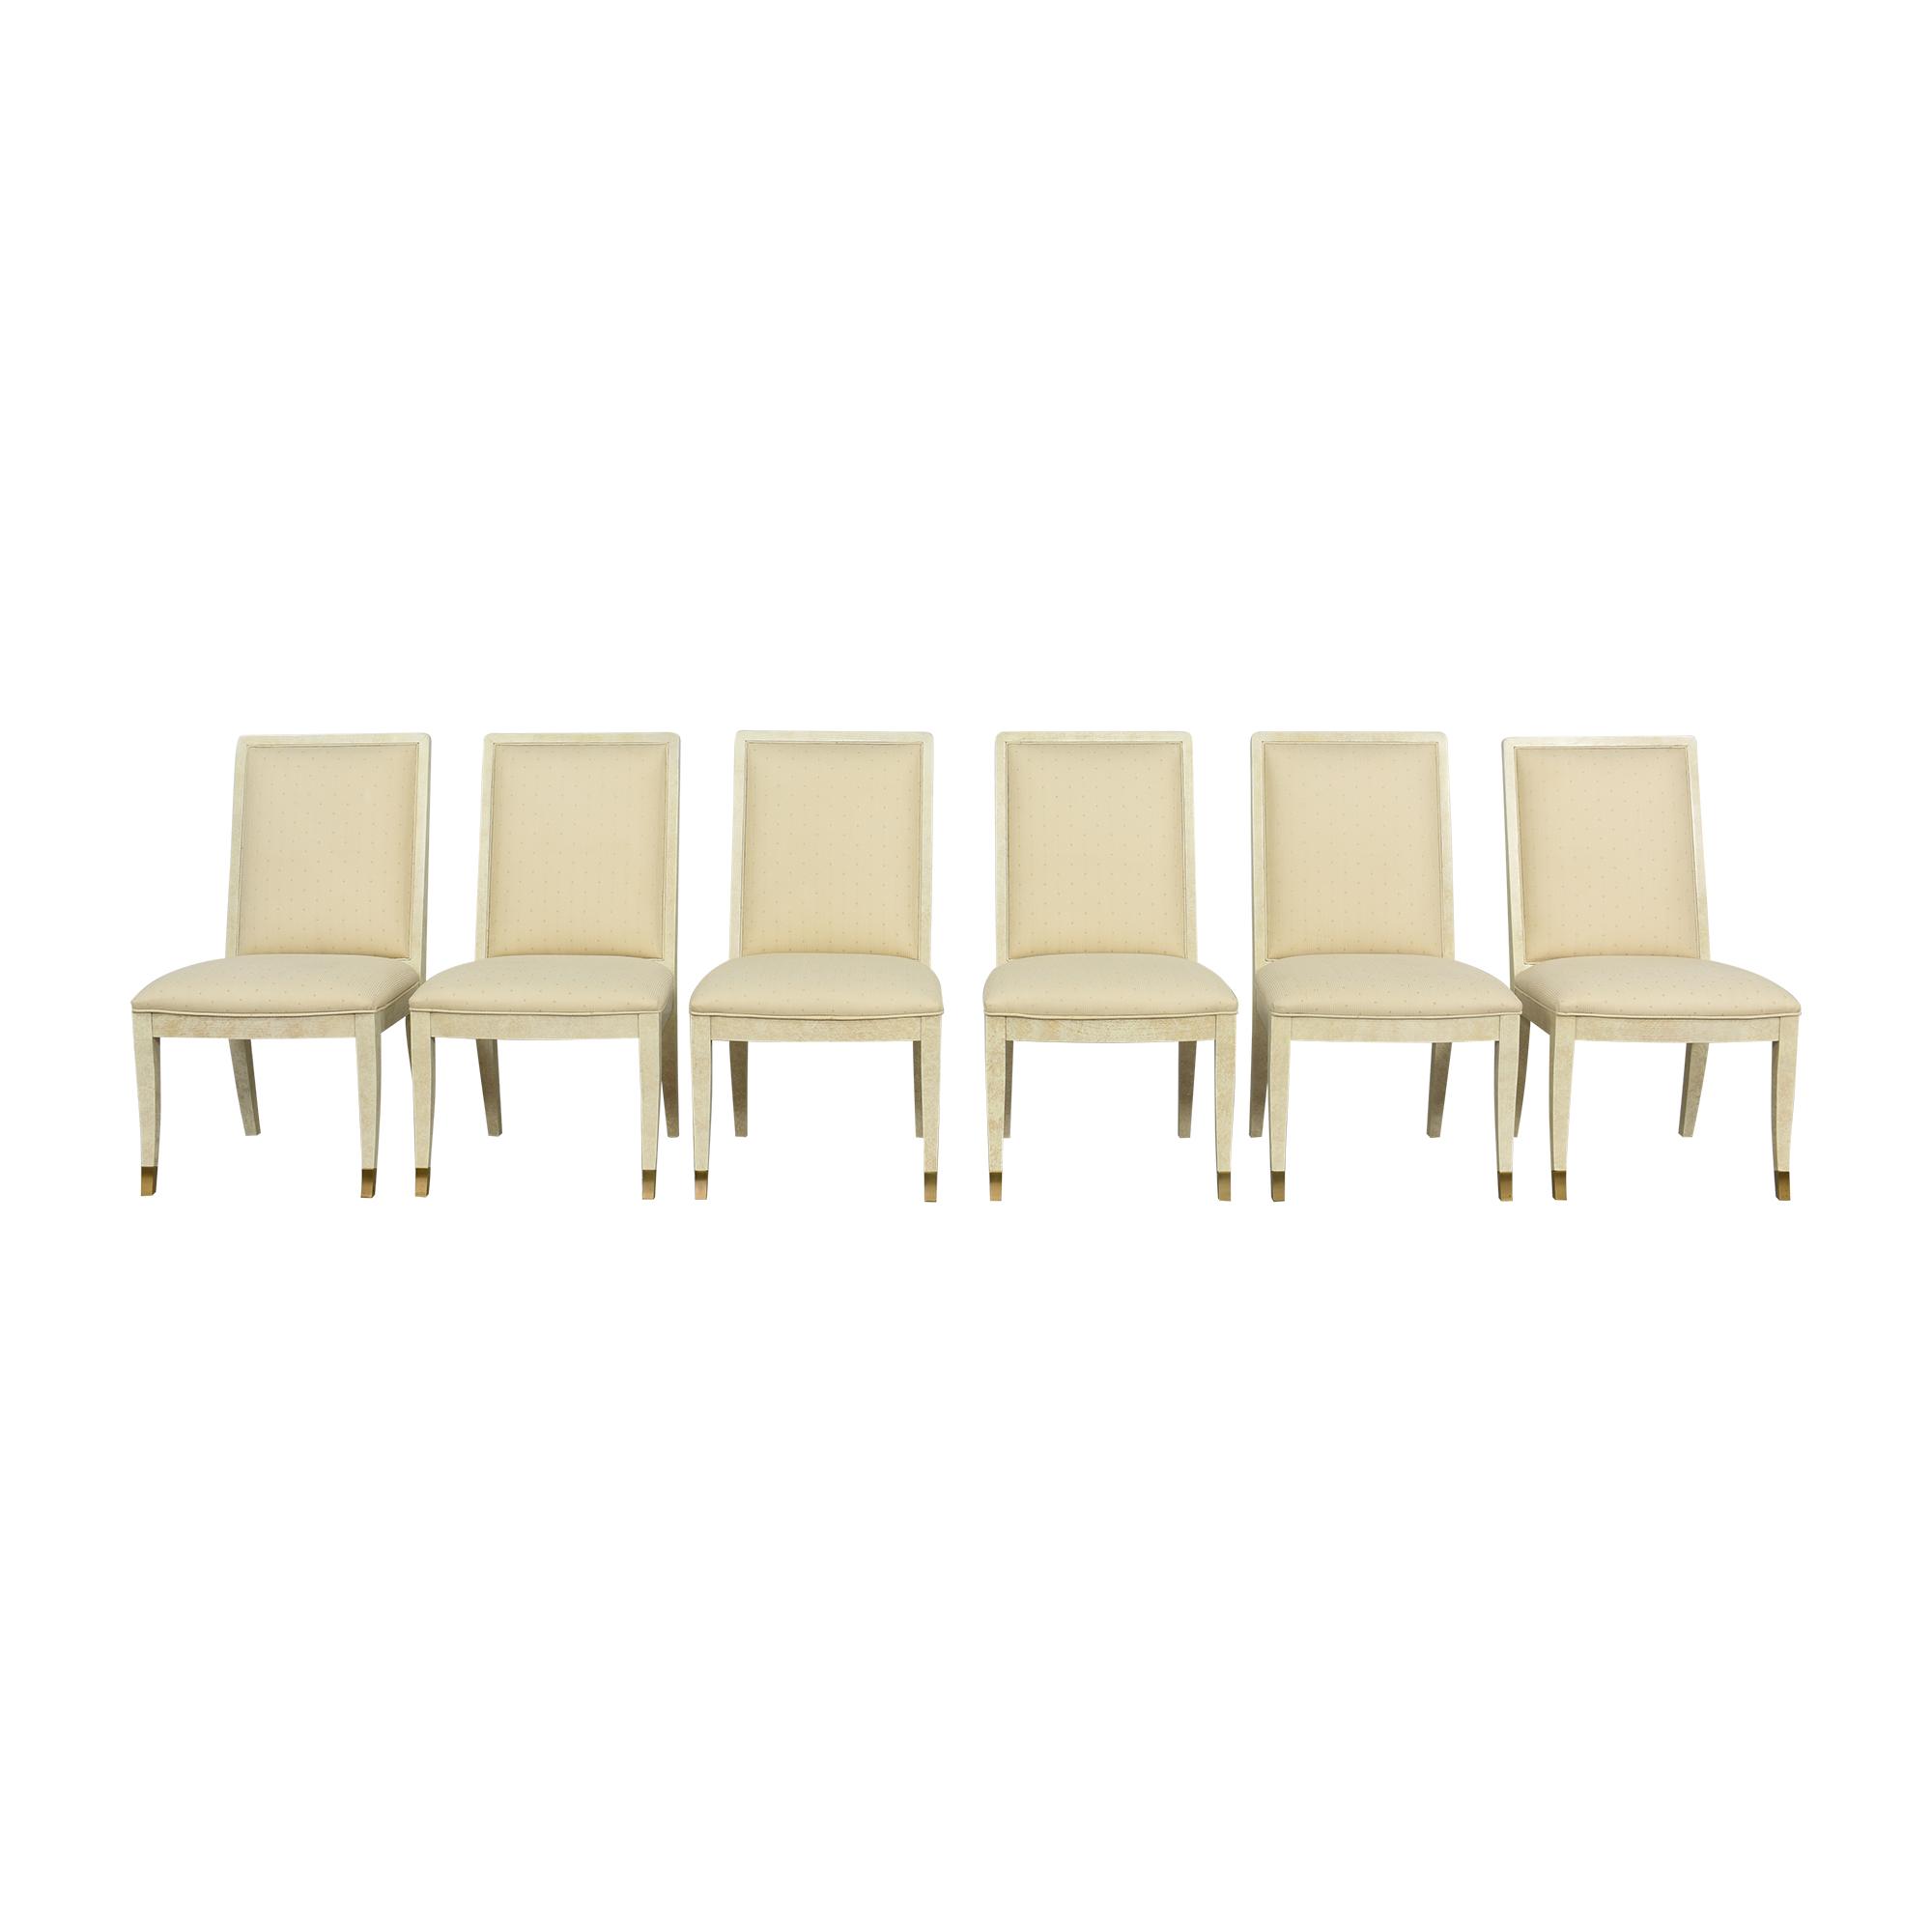 Henredon Furniture Henredon Furniture Upholstered Dining Side Chairs nj